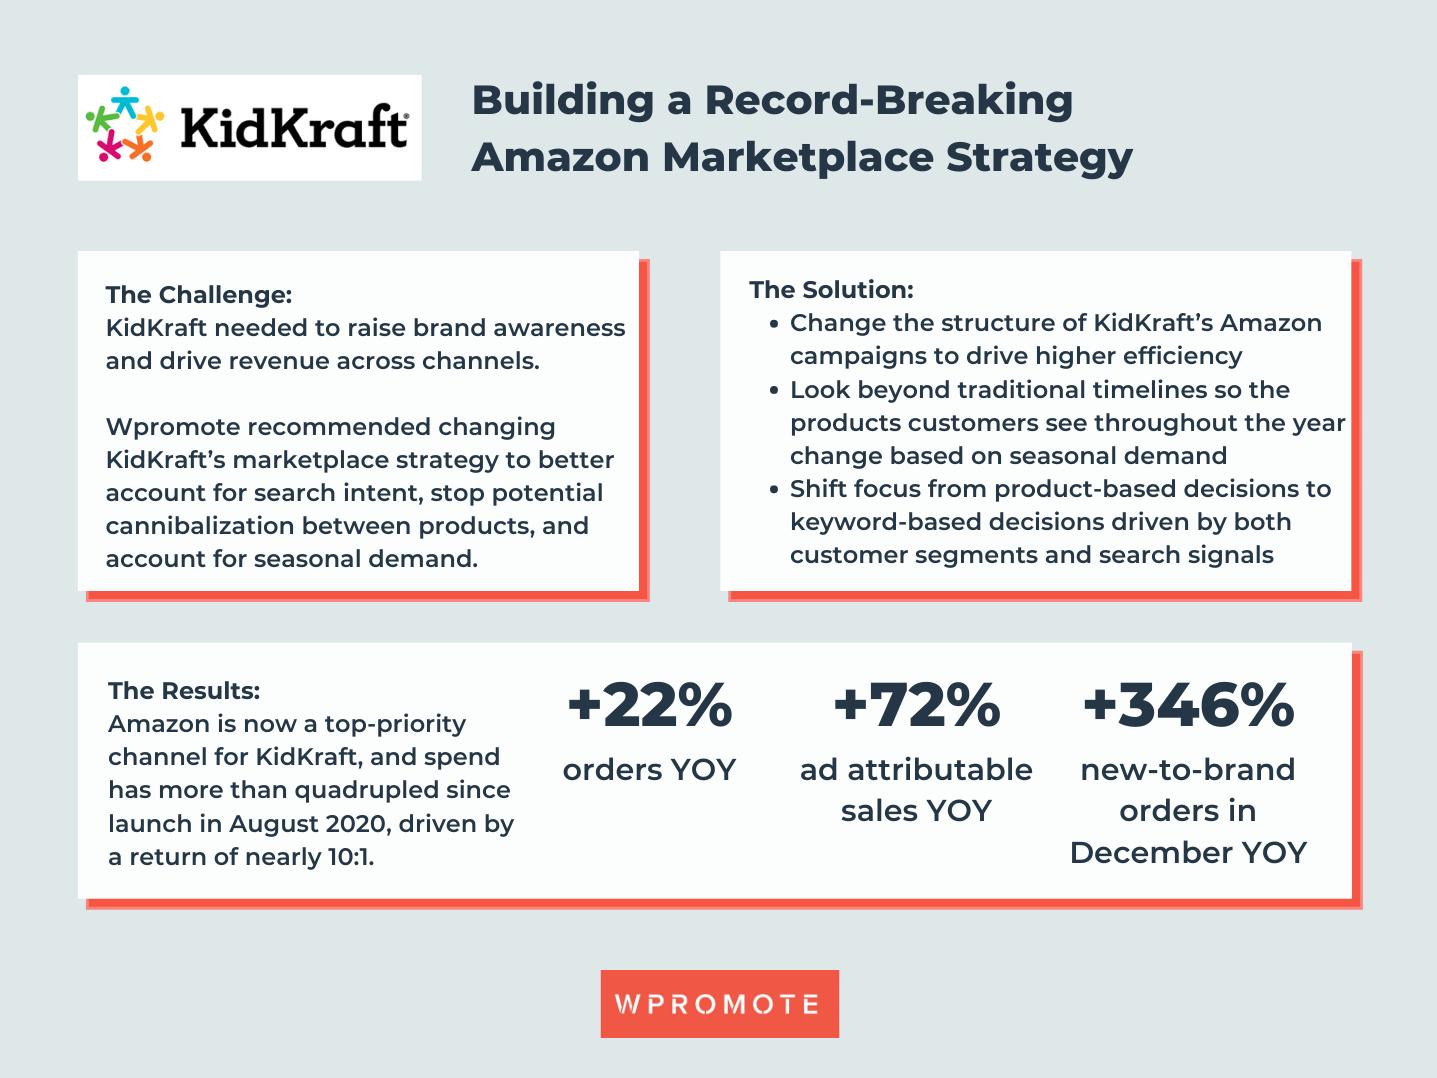 KidKraft Case Study: Building a Record-Breaking Amazon Marketplace Strategy